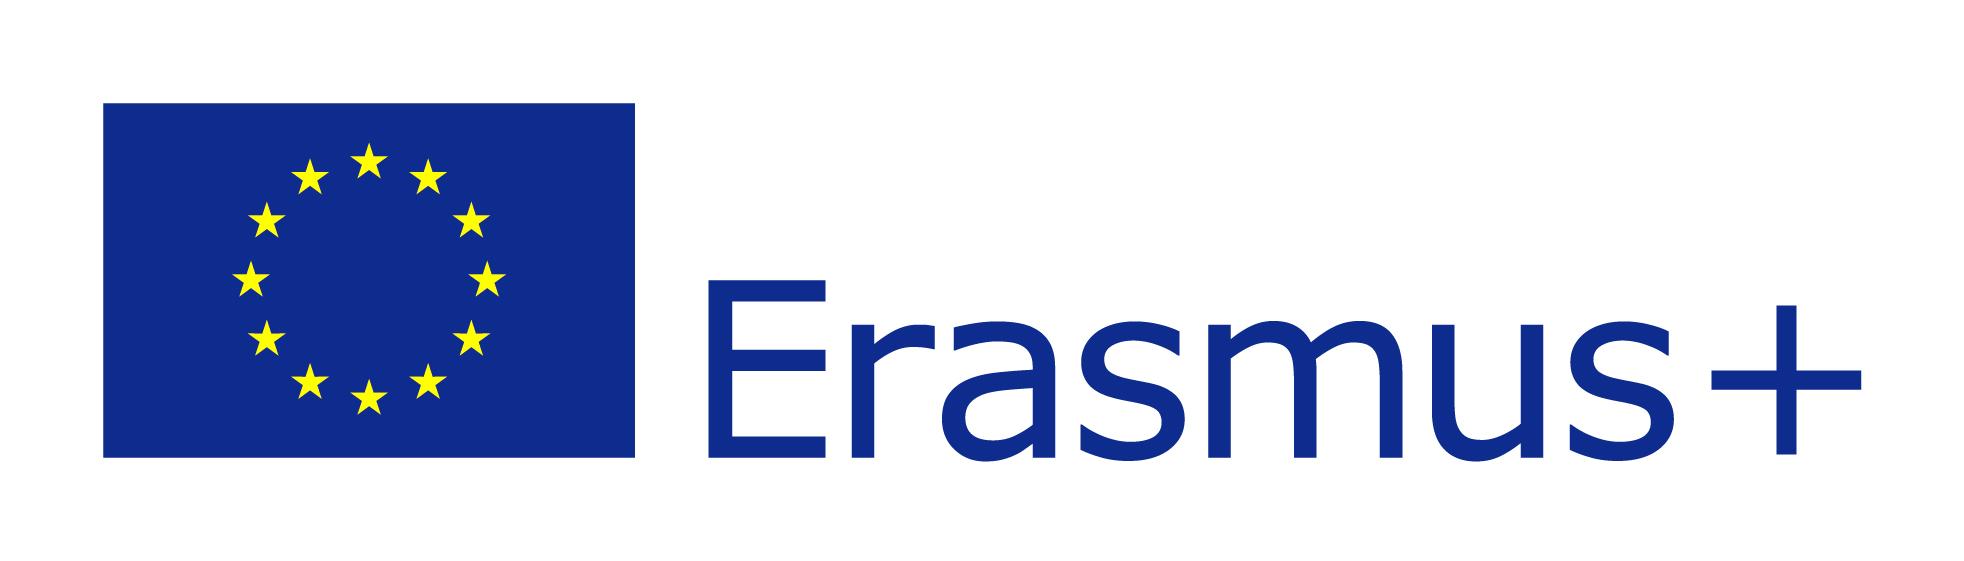 EU_flag-Erasmus__vect_POS.jpg